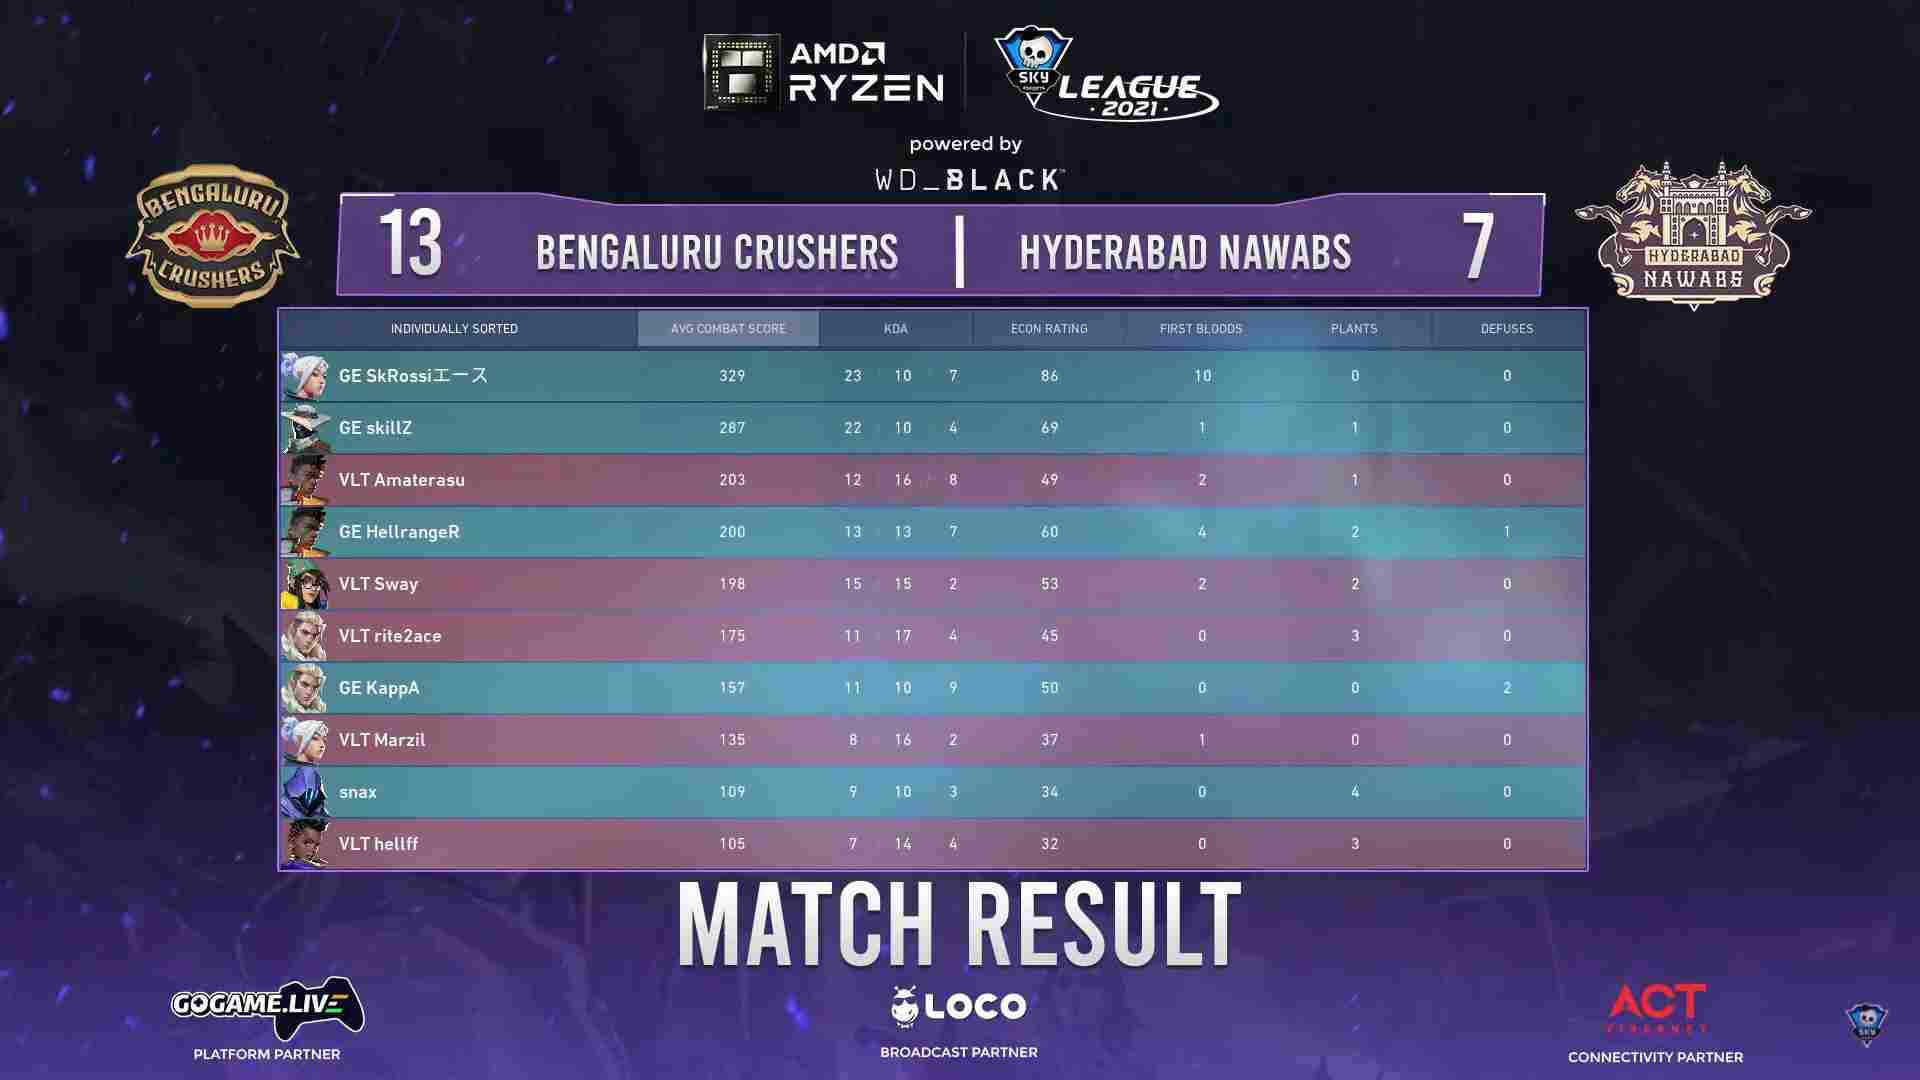 AMD Ryzen Skyesports Tournament